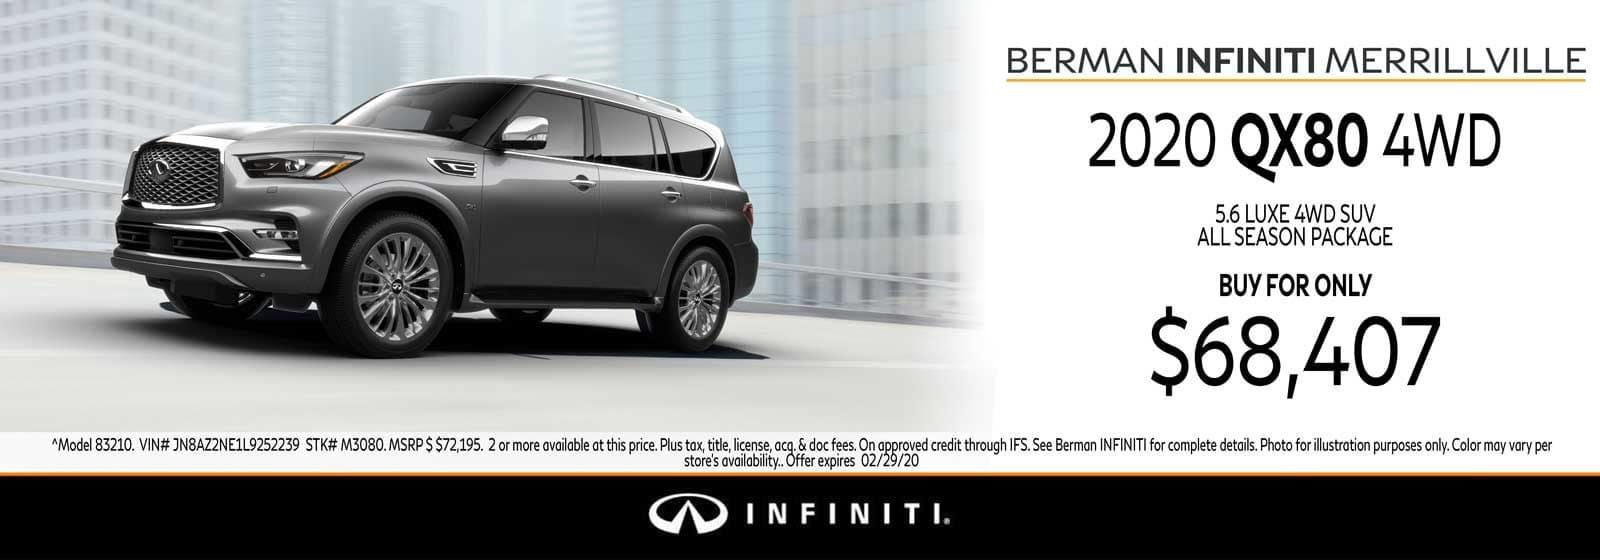 New 2020 INFINITI QX80 February Offer at Berman INFINITI of Merrillville!